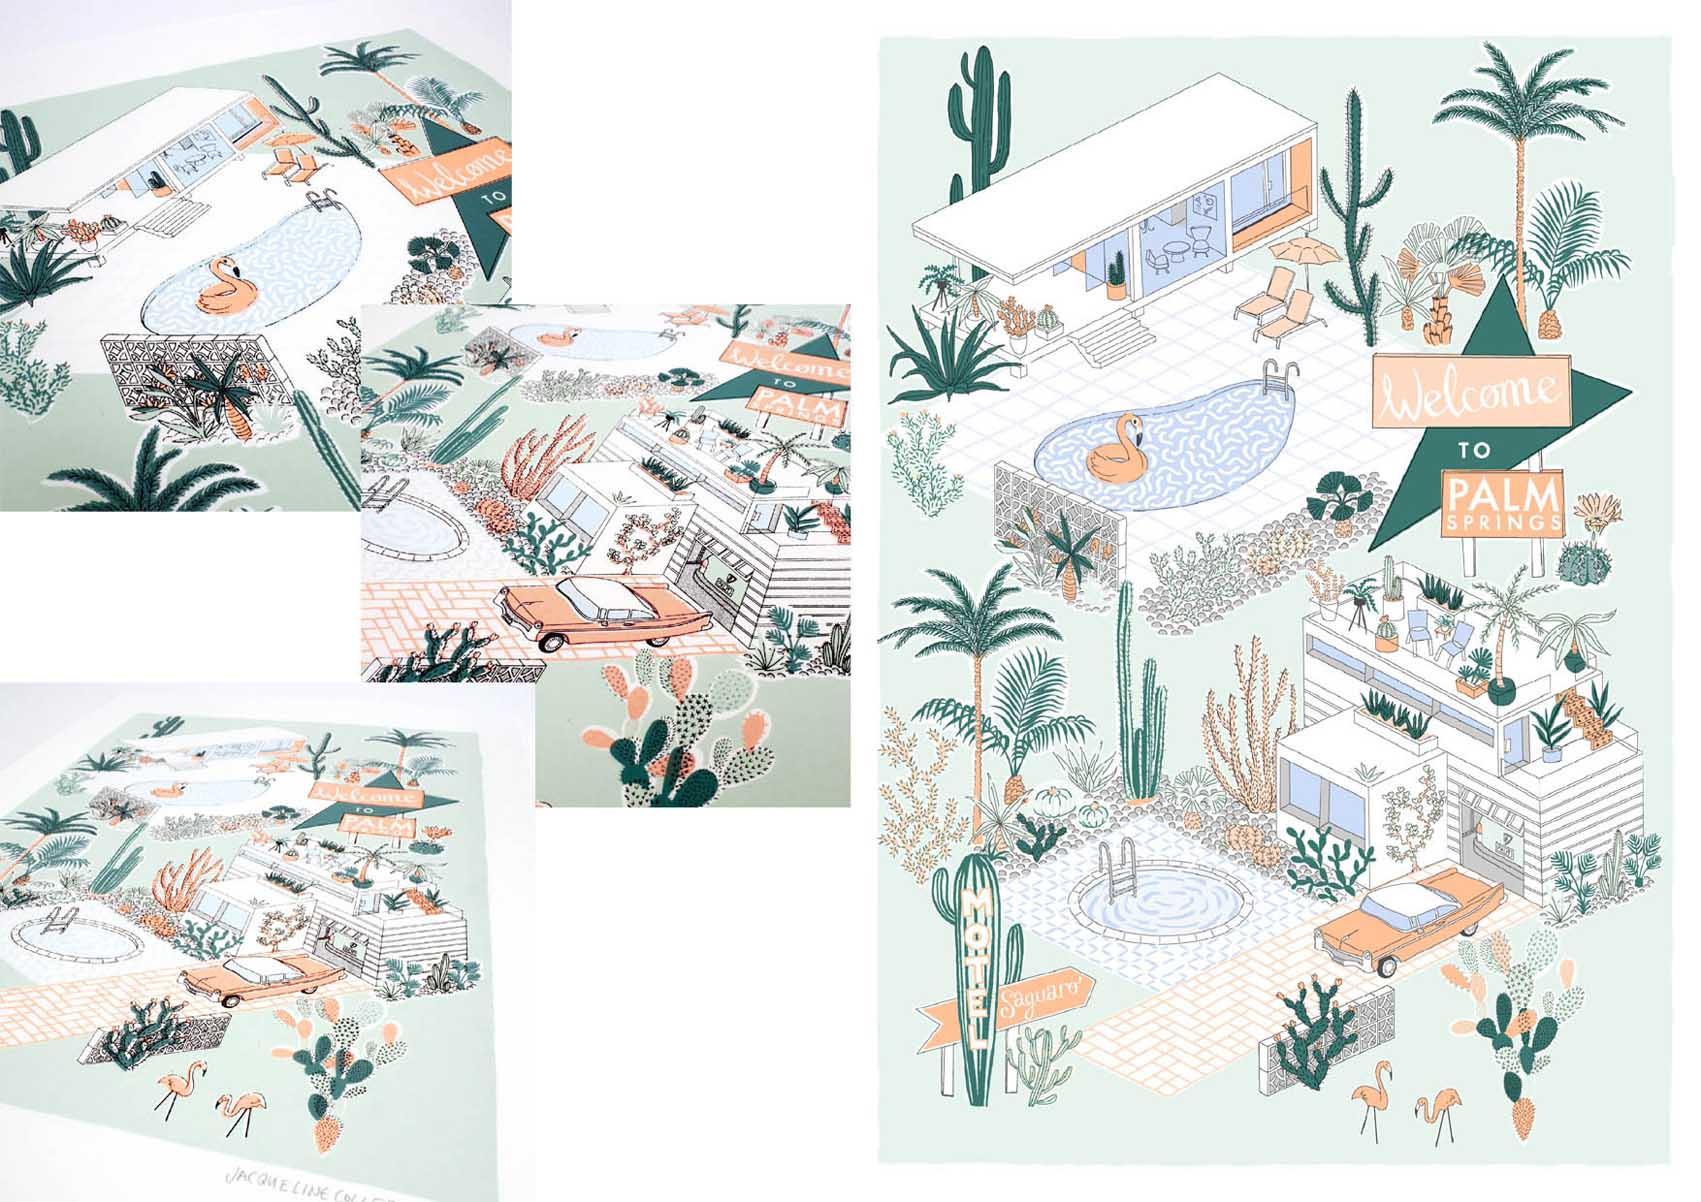 Palm-Springs-Screen-Print-sm.jpg